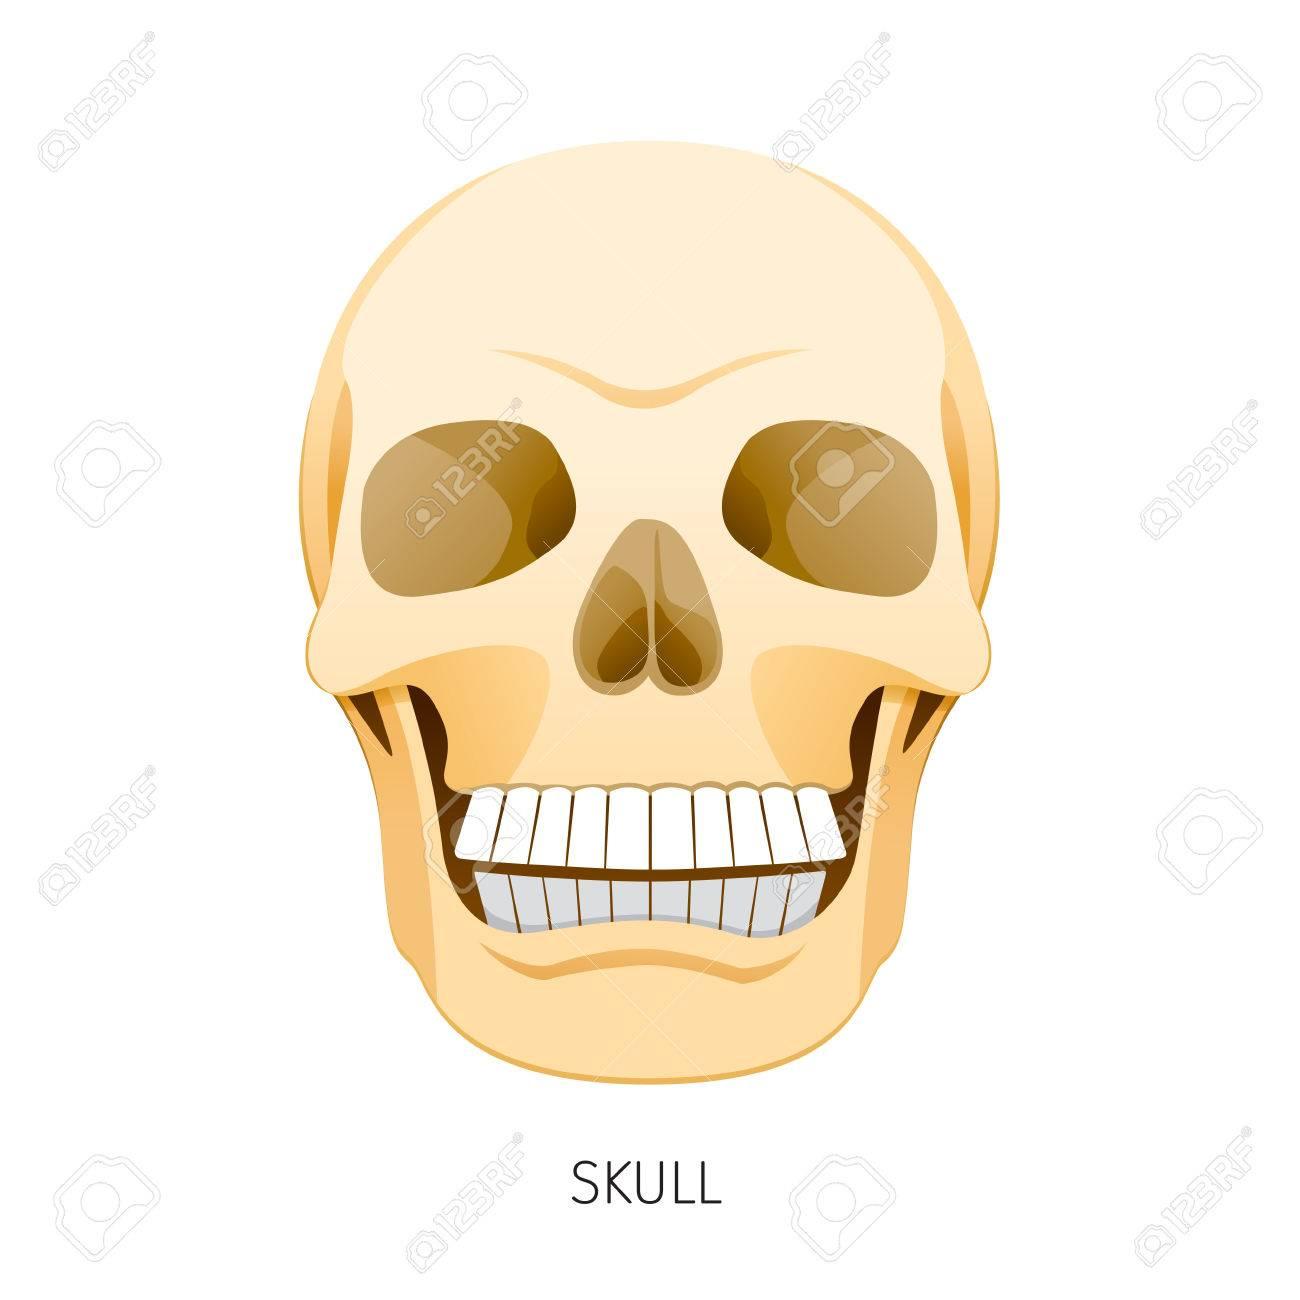 Skull, Human Internal Organs Organ Diagram, Physiology, Structure ...